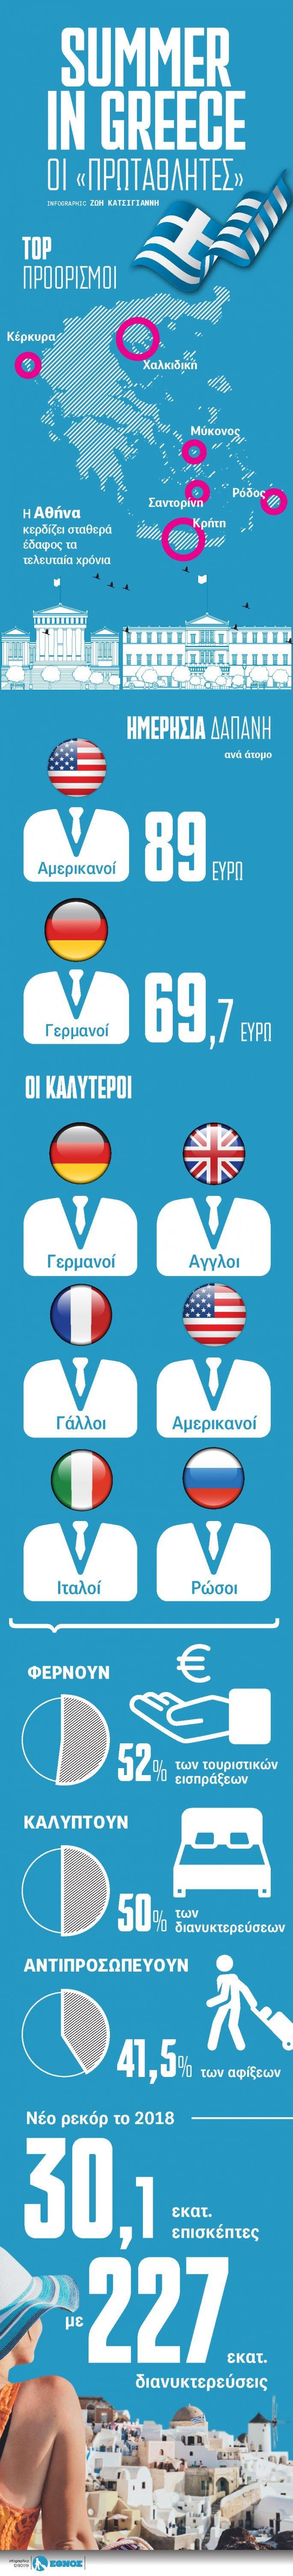 tourismos-greece Η Κρήτη μεταξύ των πρωταθλητών του τουρισμού